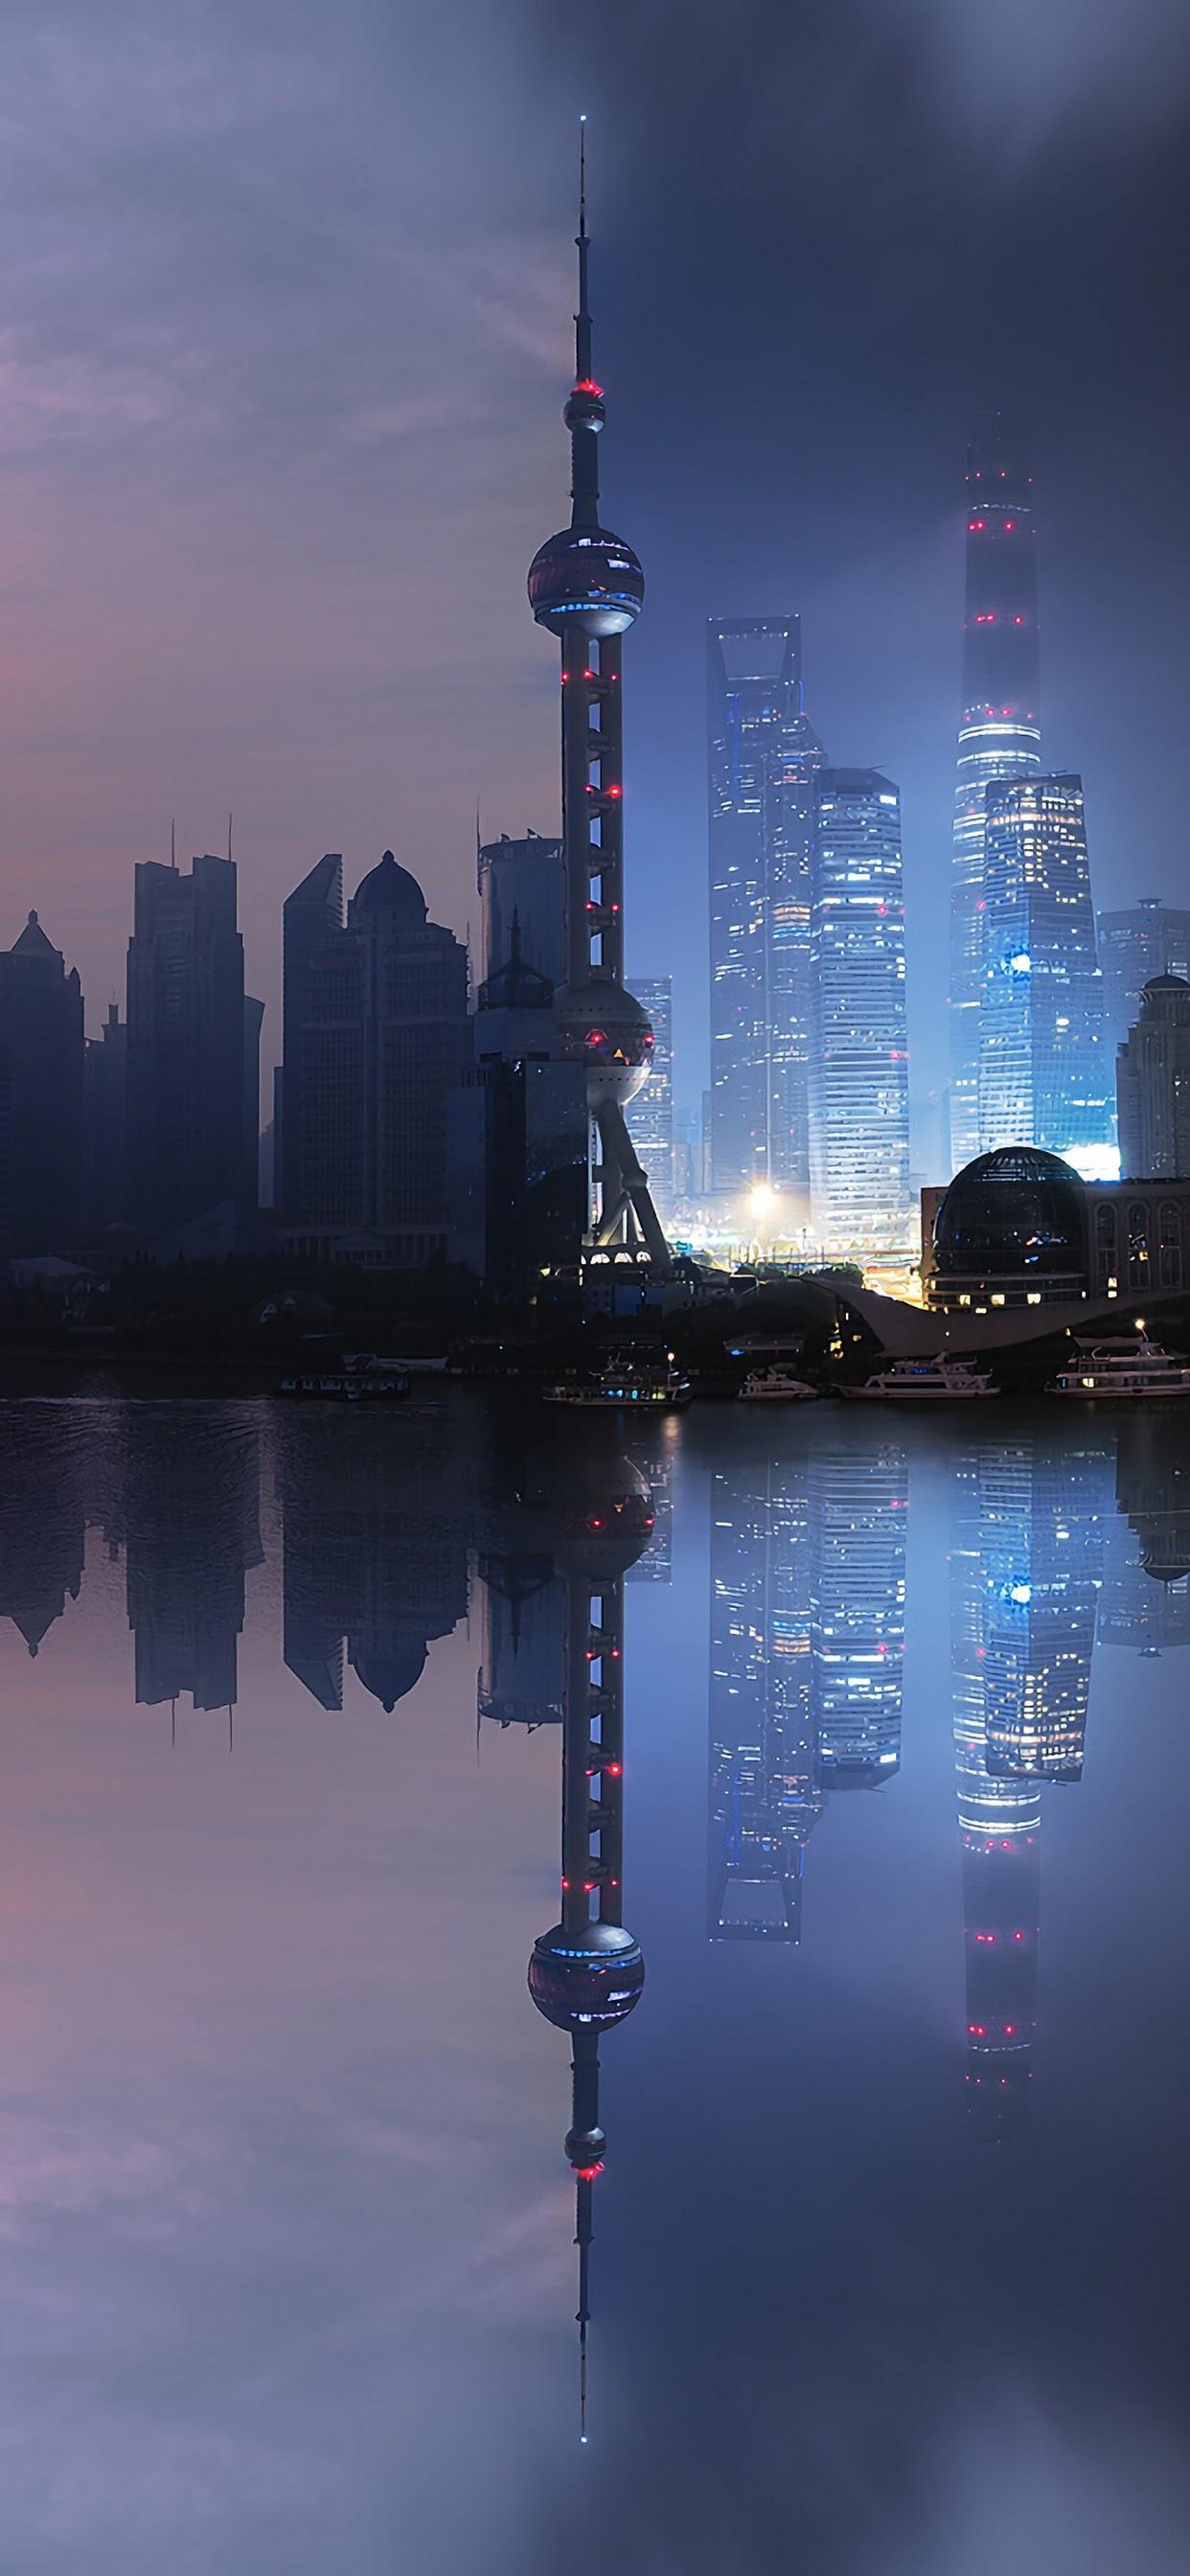 Shanghai City Buildings Landscape Scenery 4k Wallpaper 88